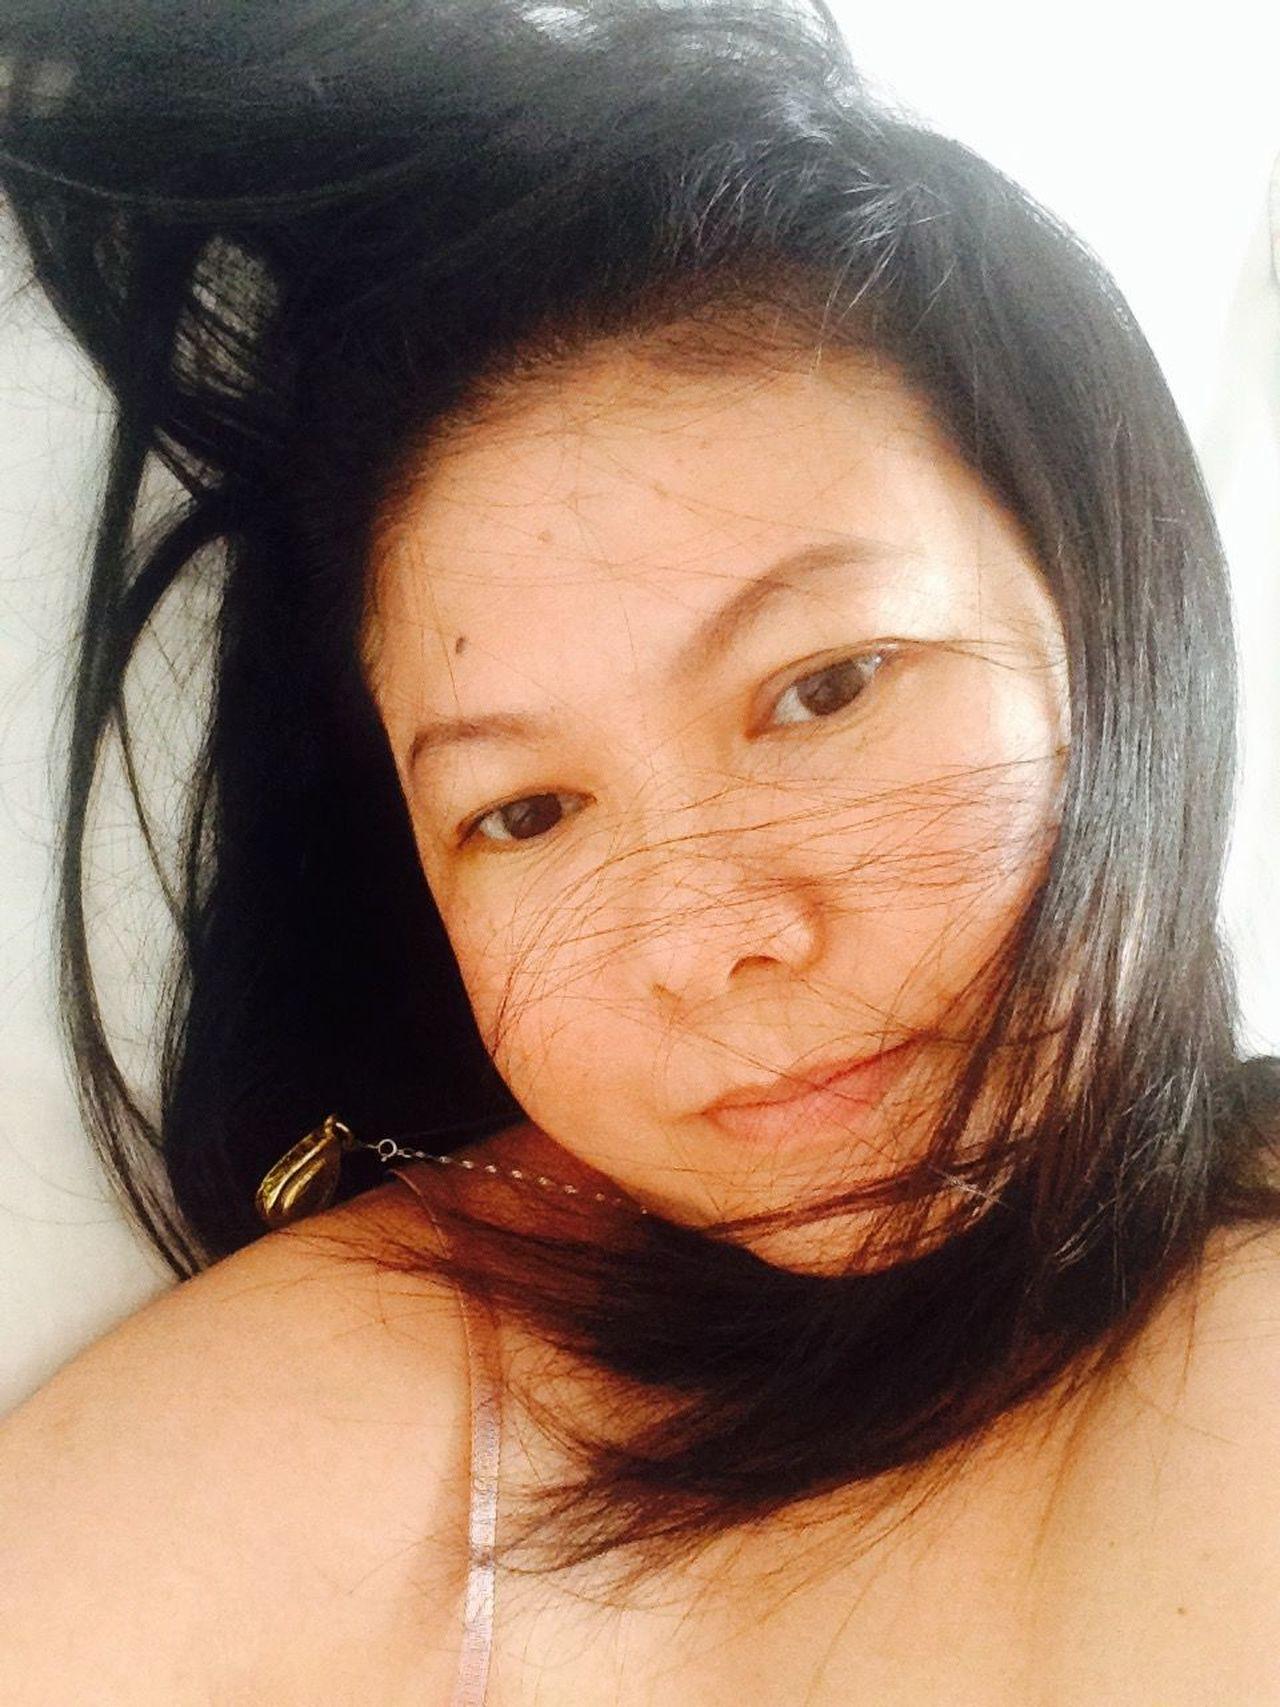 Goodnight Iyigeceler Goede Nacht Buona Notte Buenasnoches Oyasuminasai Gute Nacht Annyeonghi Jumuseyo ราตรีสวัสดิ์ ....💋💋.... Ampai Jangbumrung 🏌